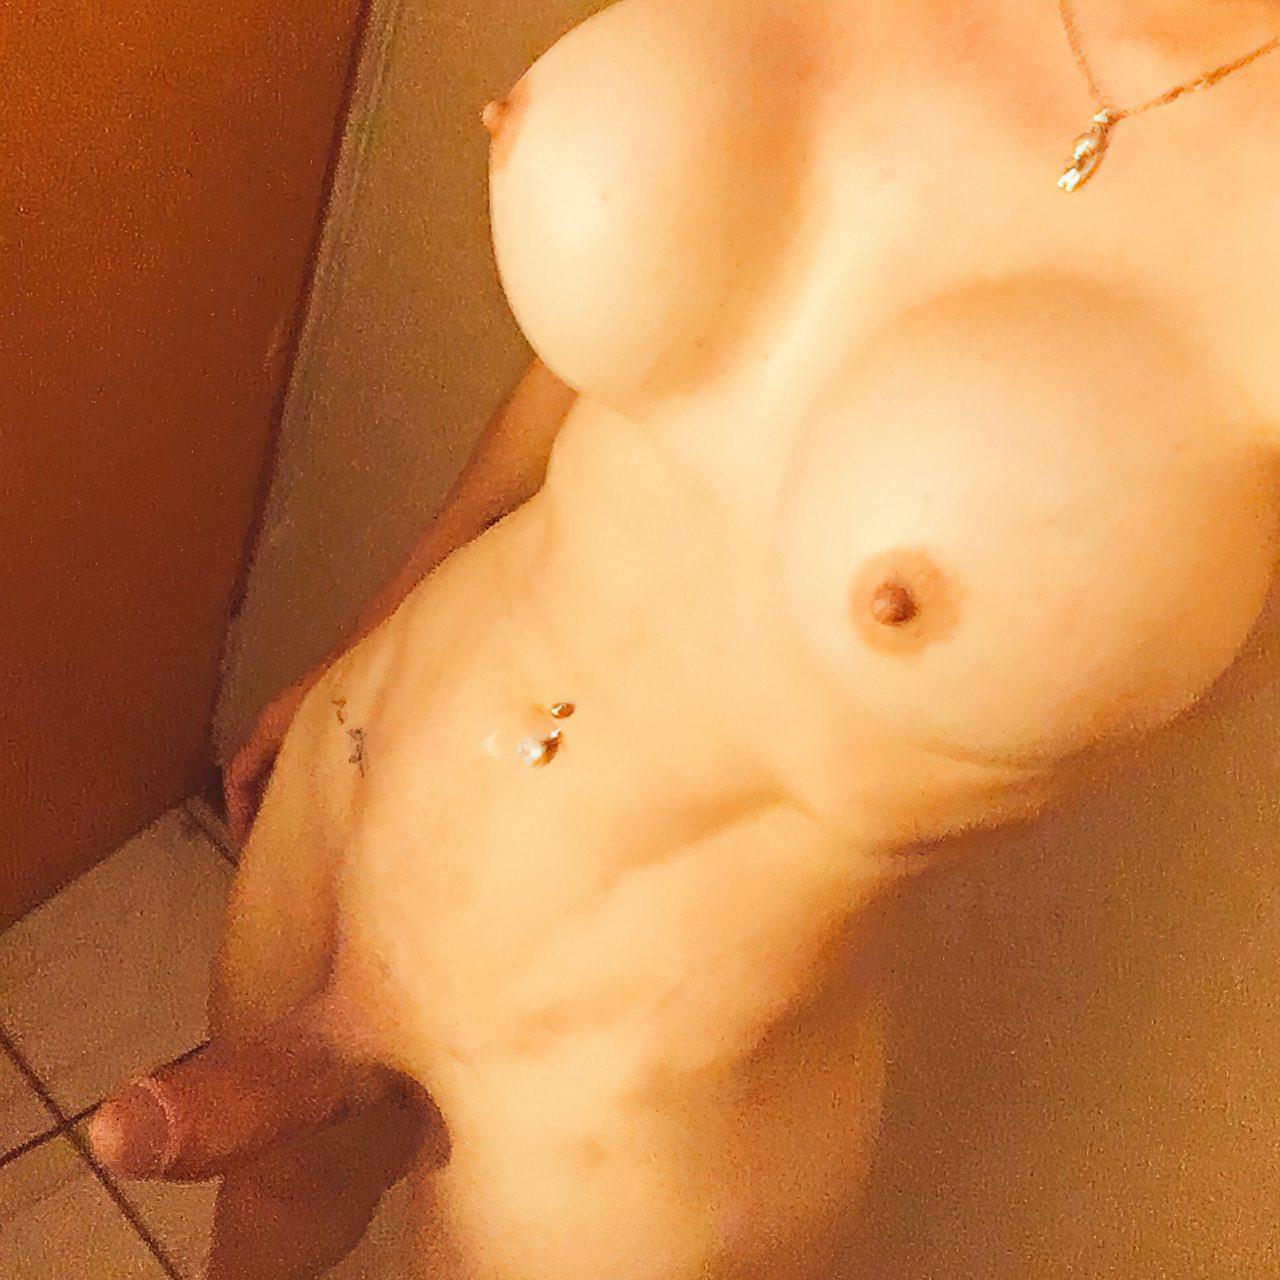 Travestis Pictures (36)